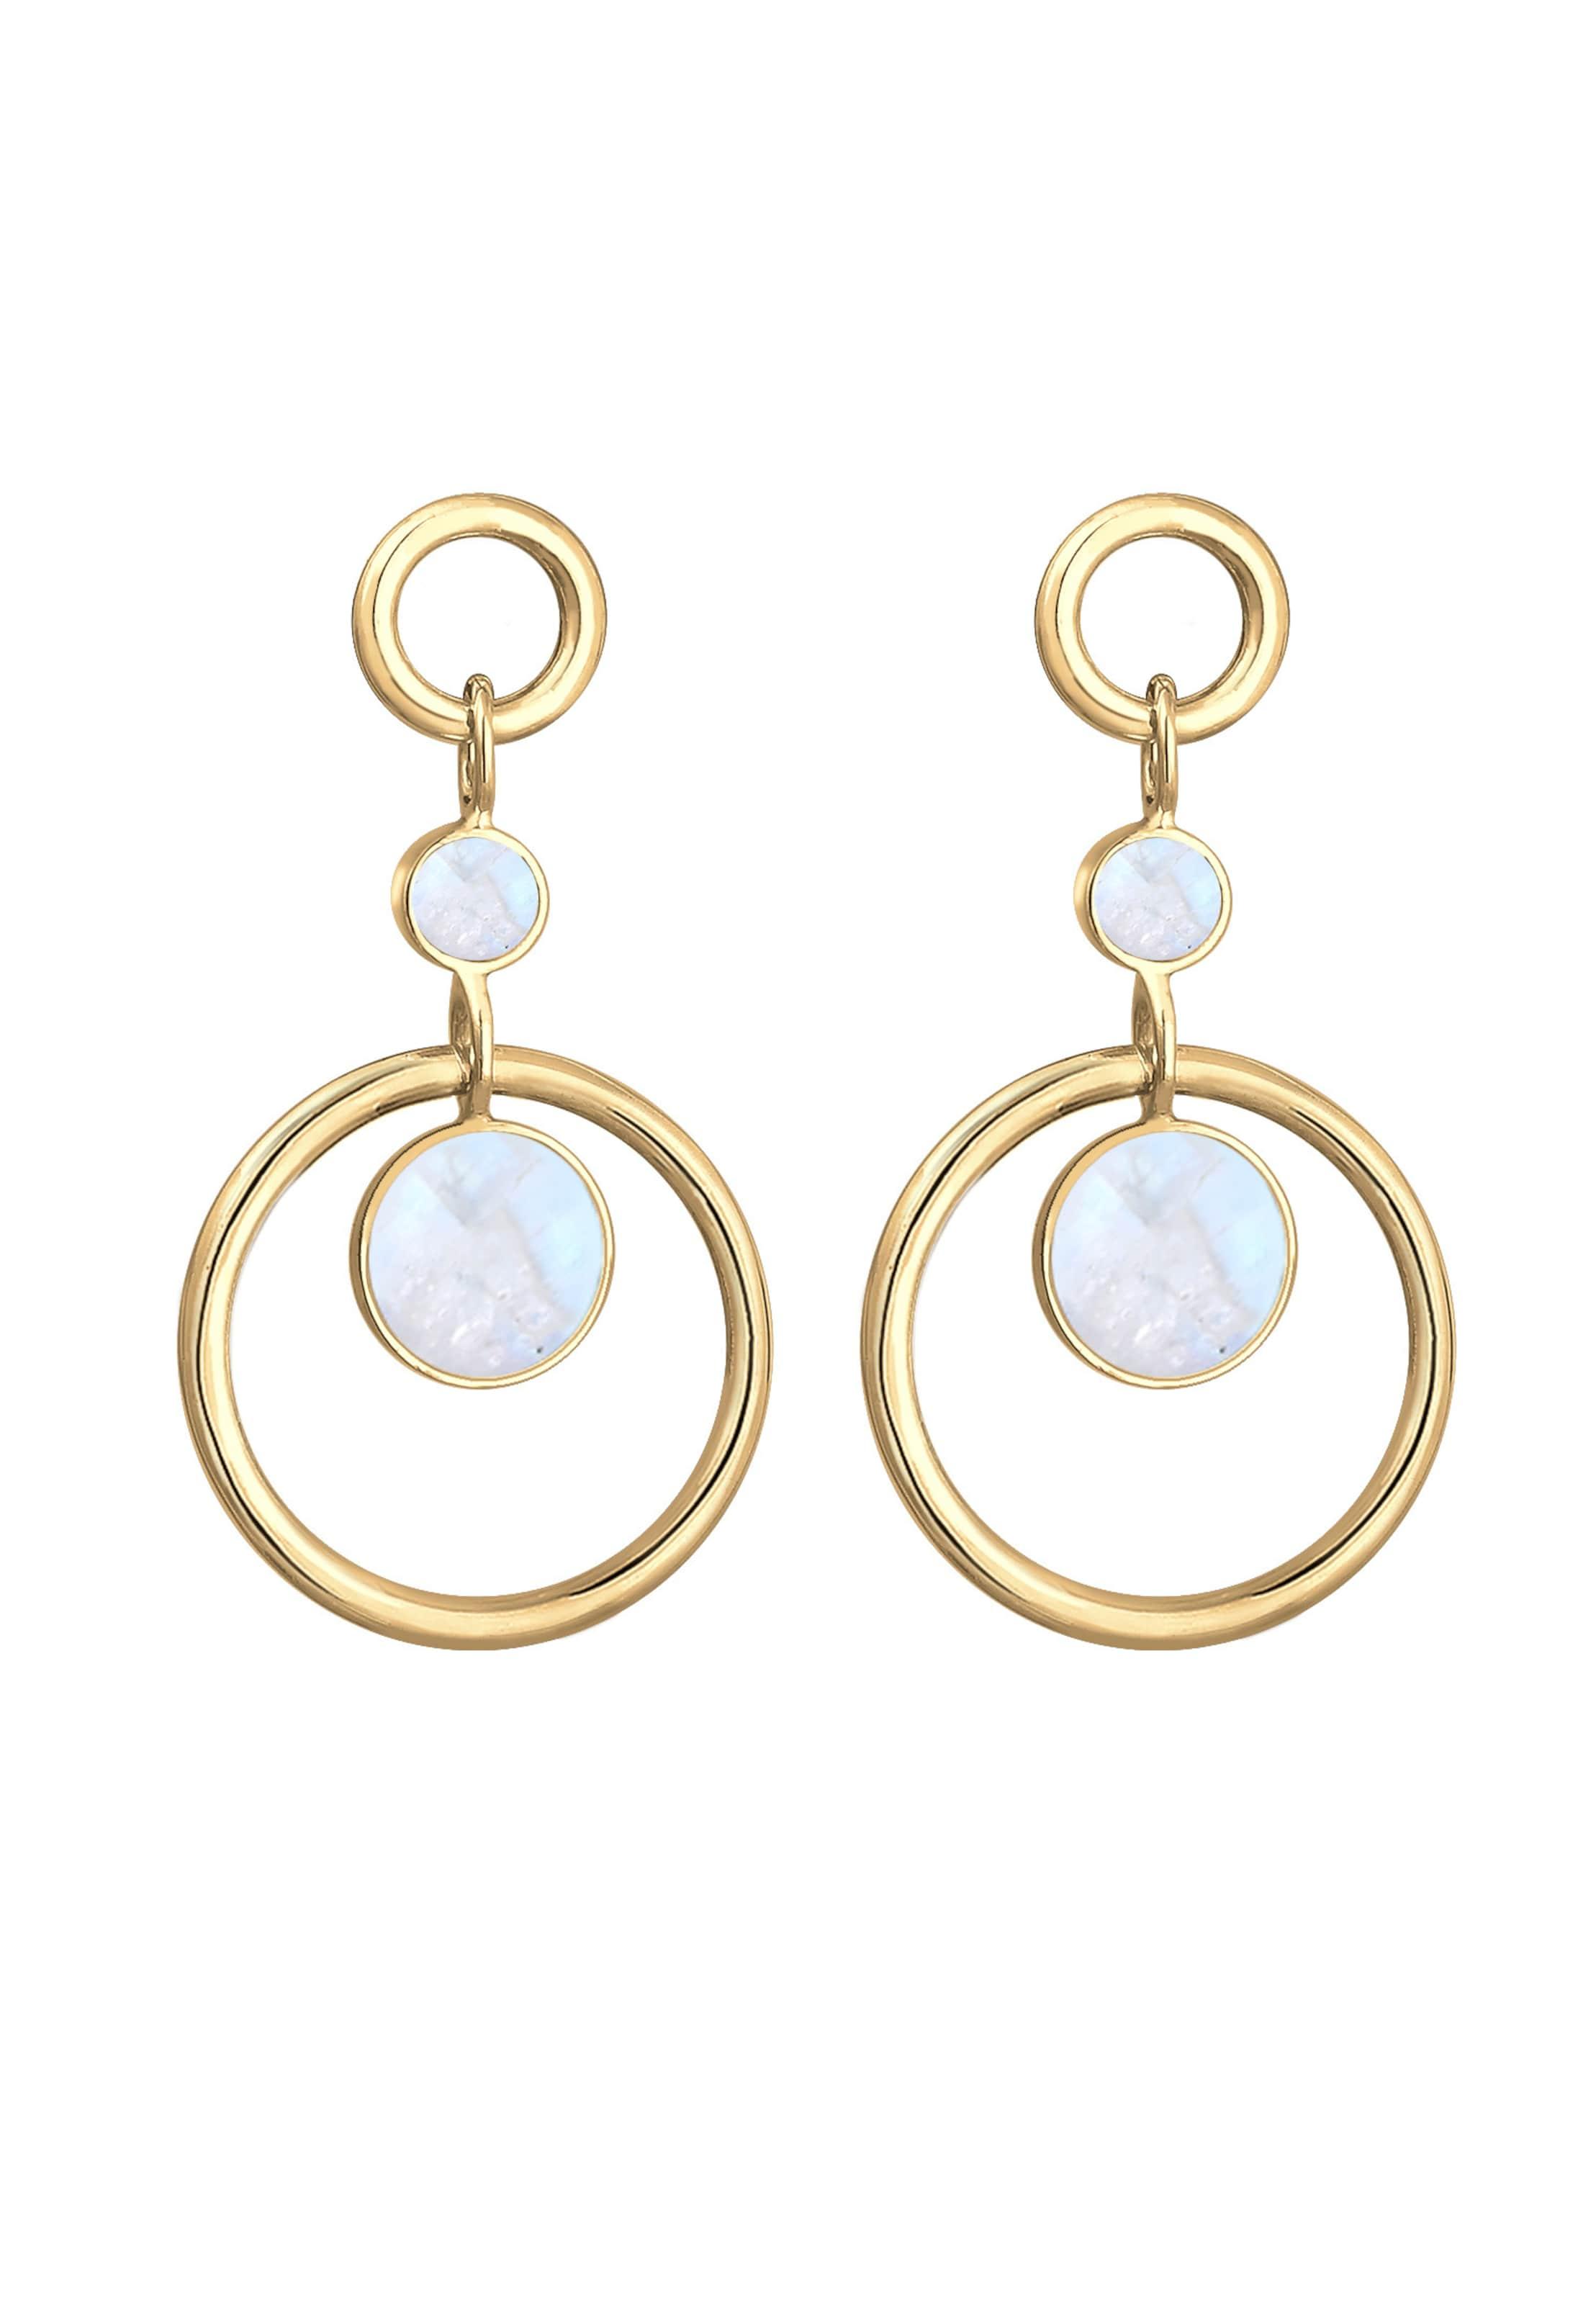 Elli D'oreilles Boucles Bleu En ClairOr Premium wX08nNOPk